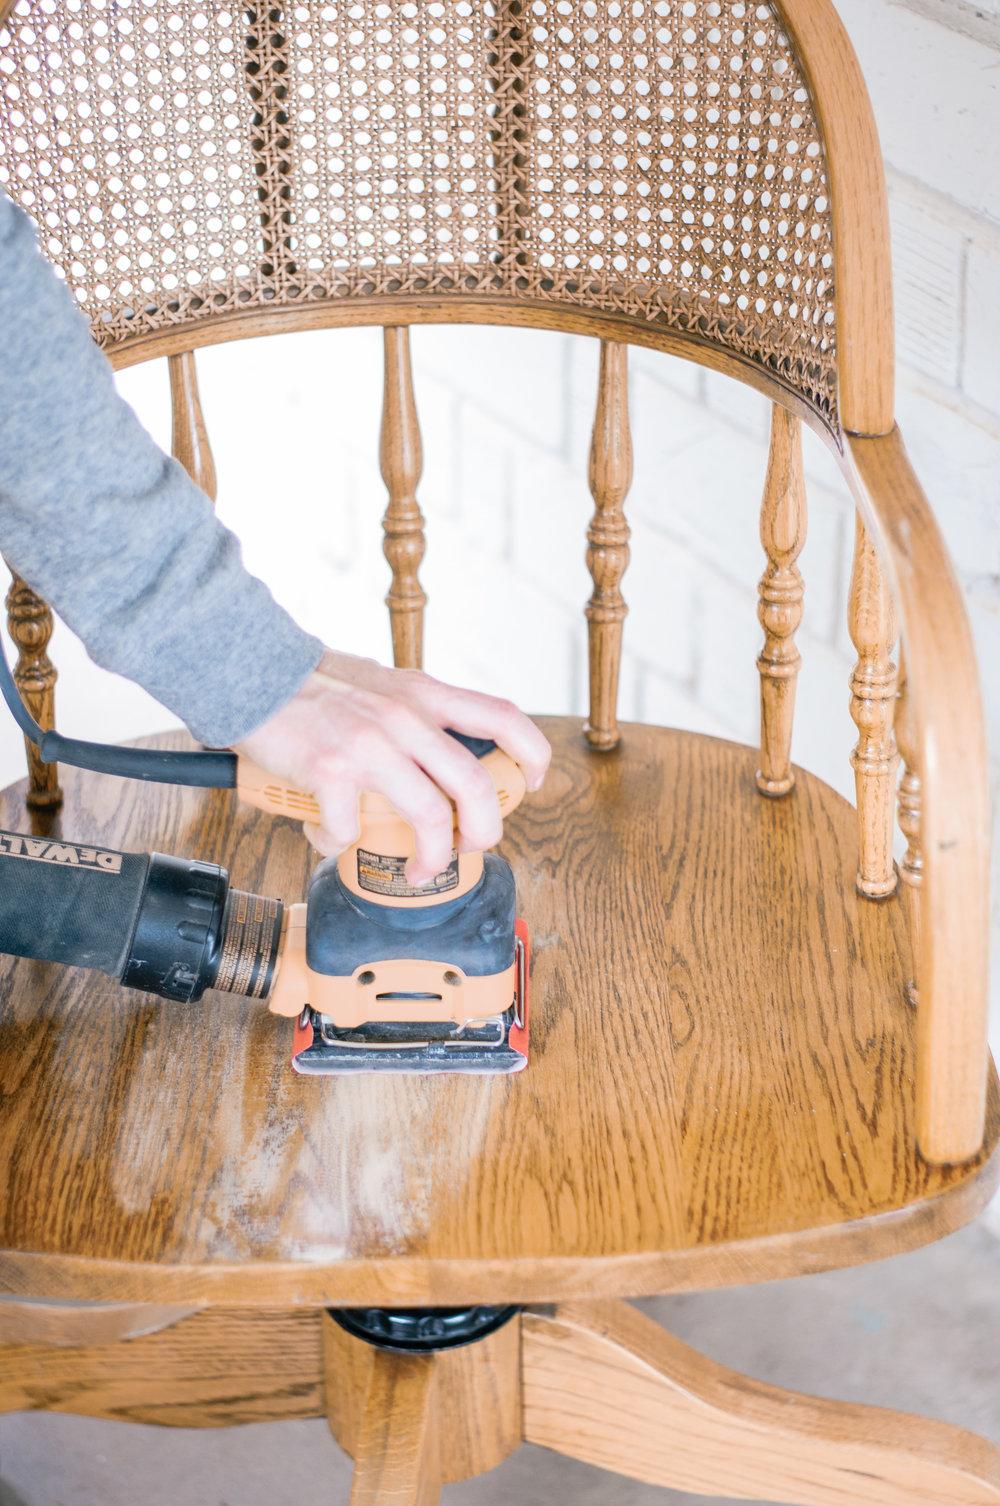 DIY Cane Wood Chair Redo